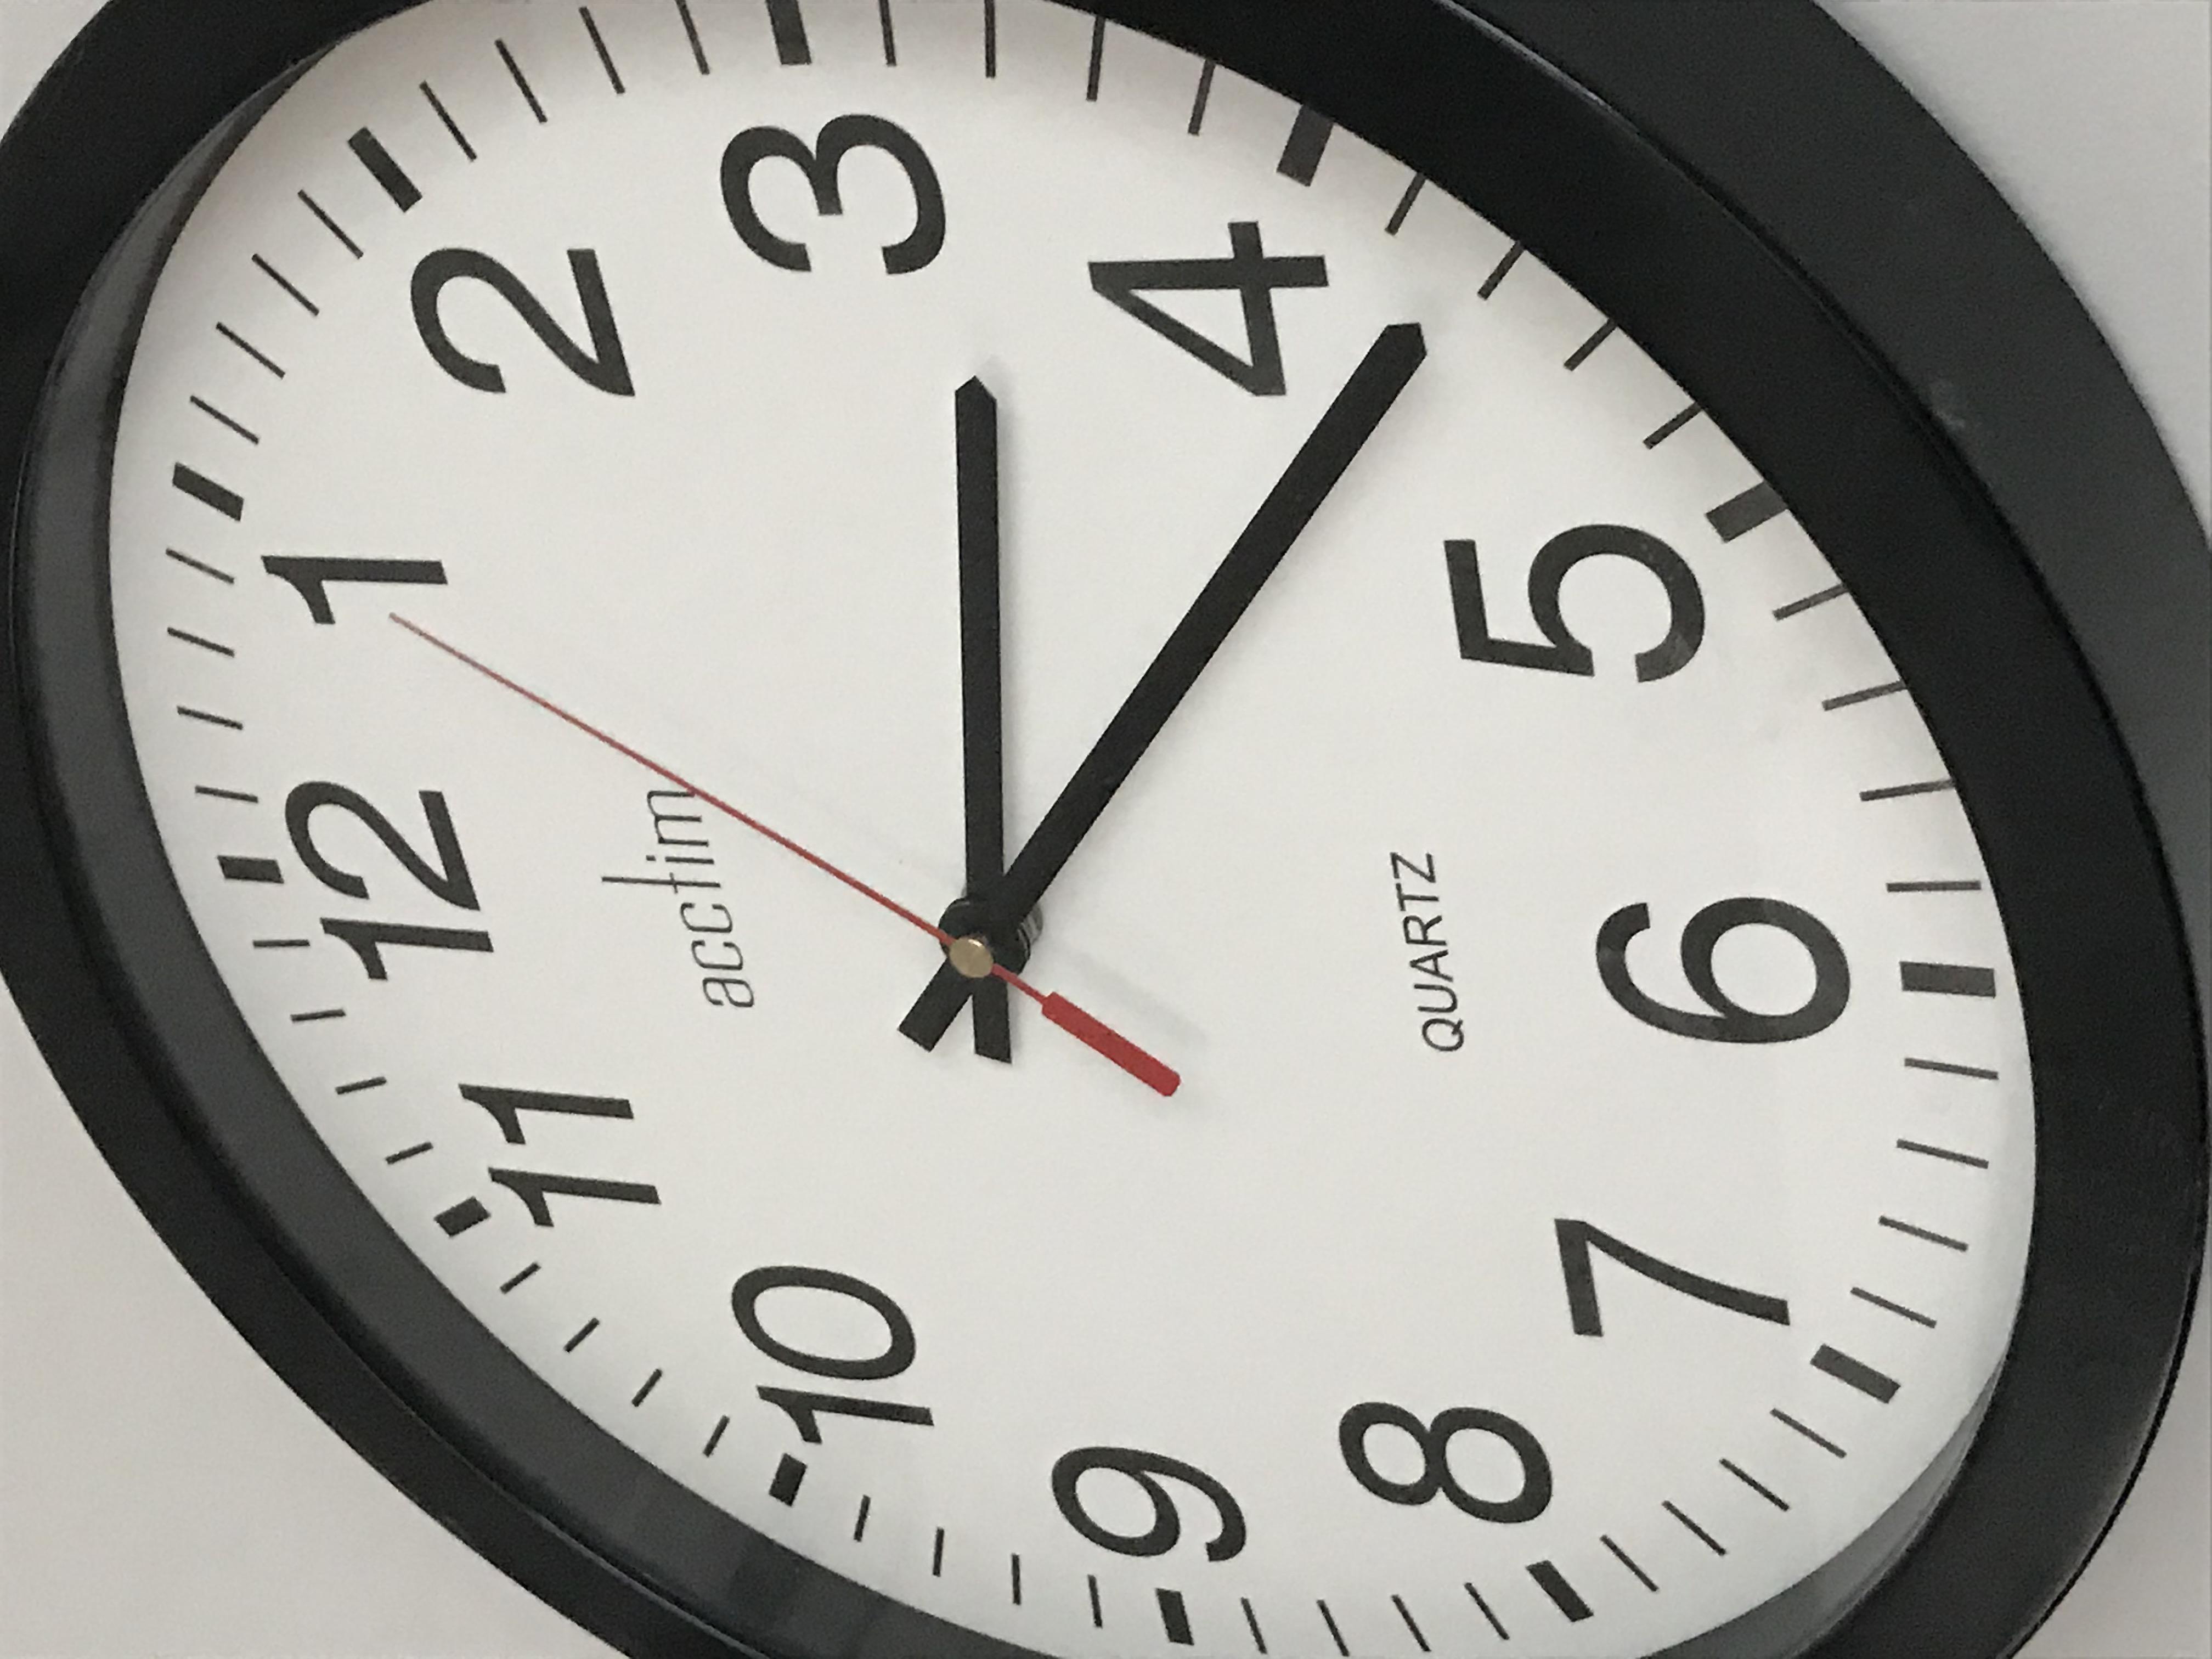 Team productivity, clock, time